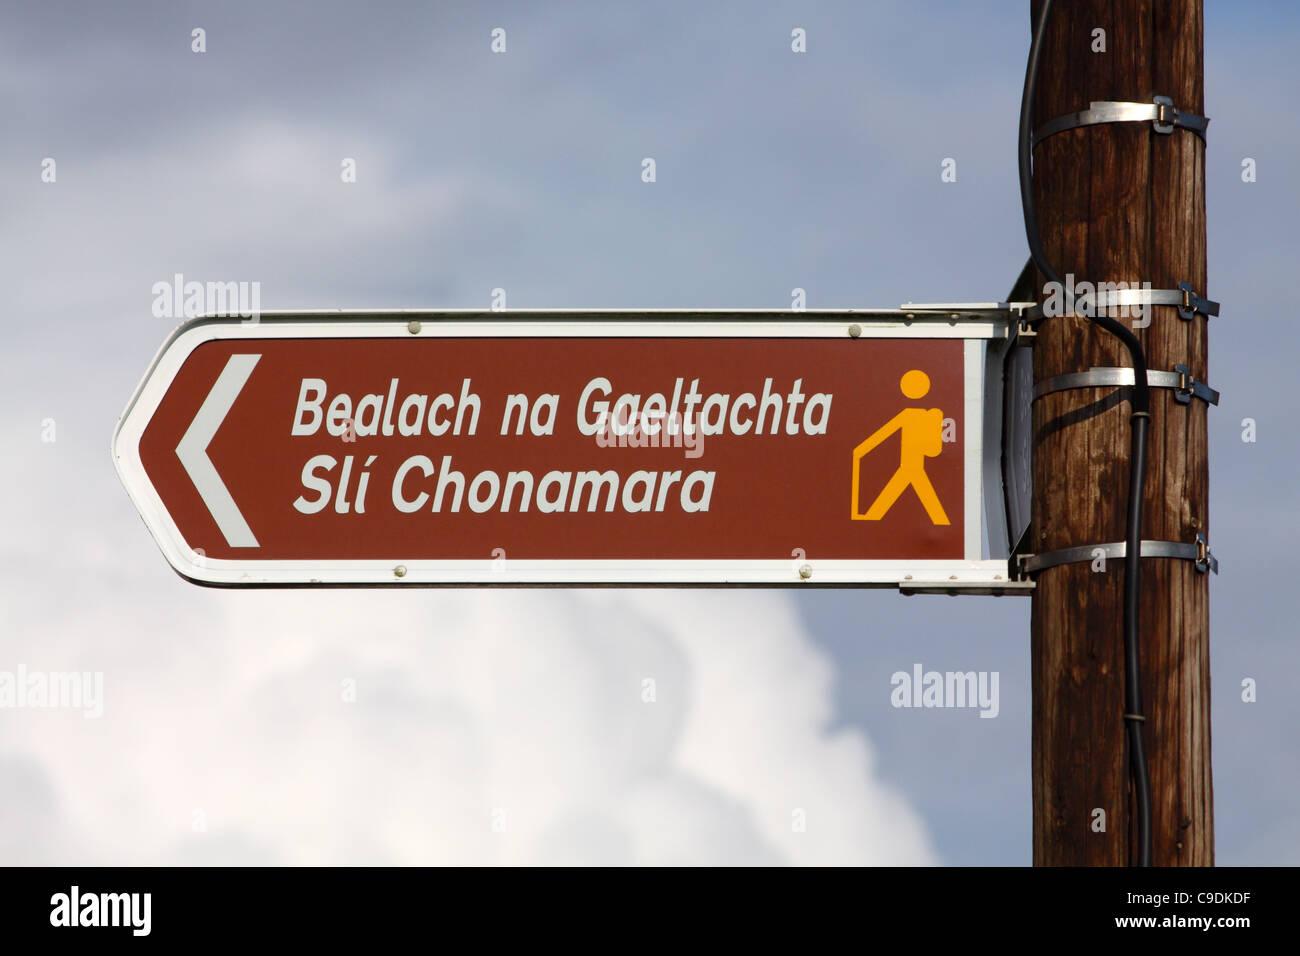 Irish language sign for Connemara Way walking route in the West of Ireland - Stock Image